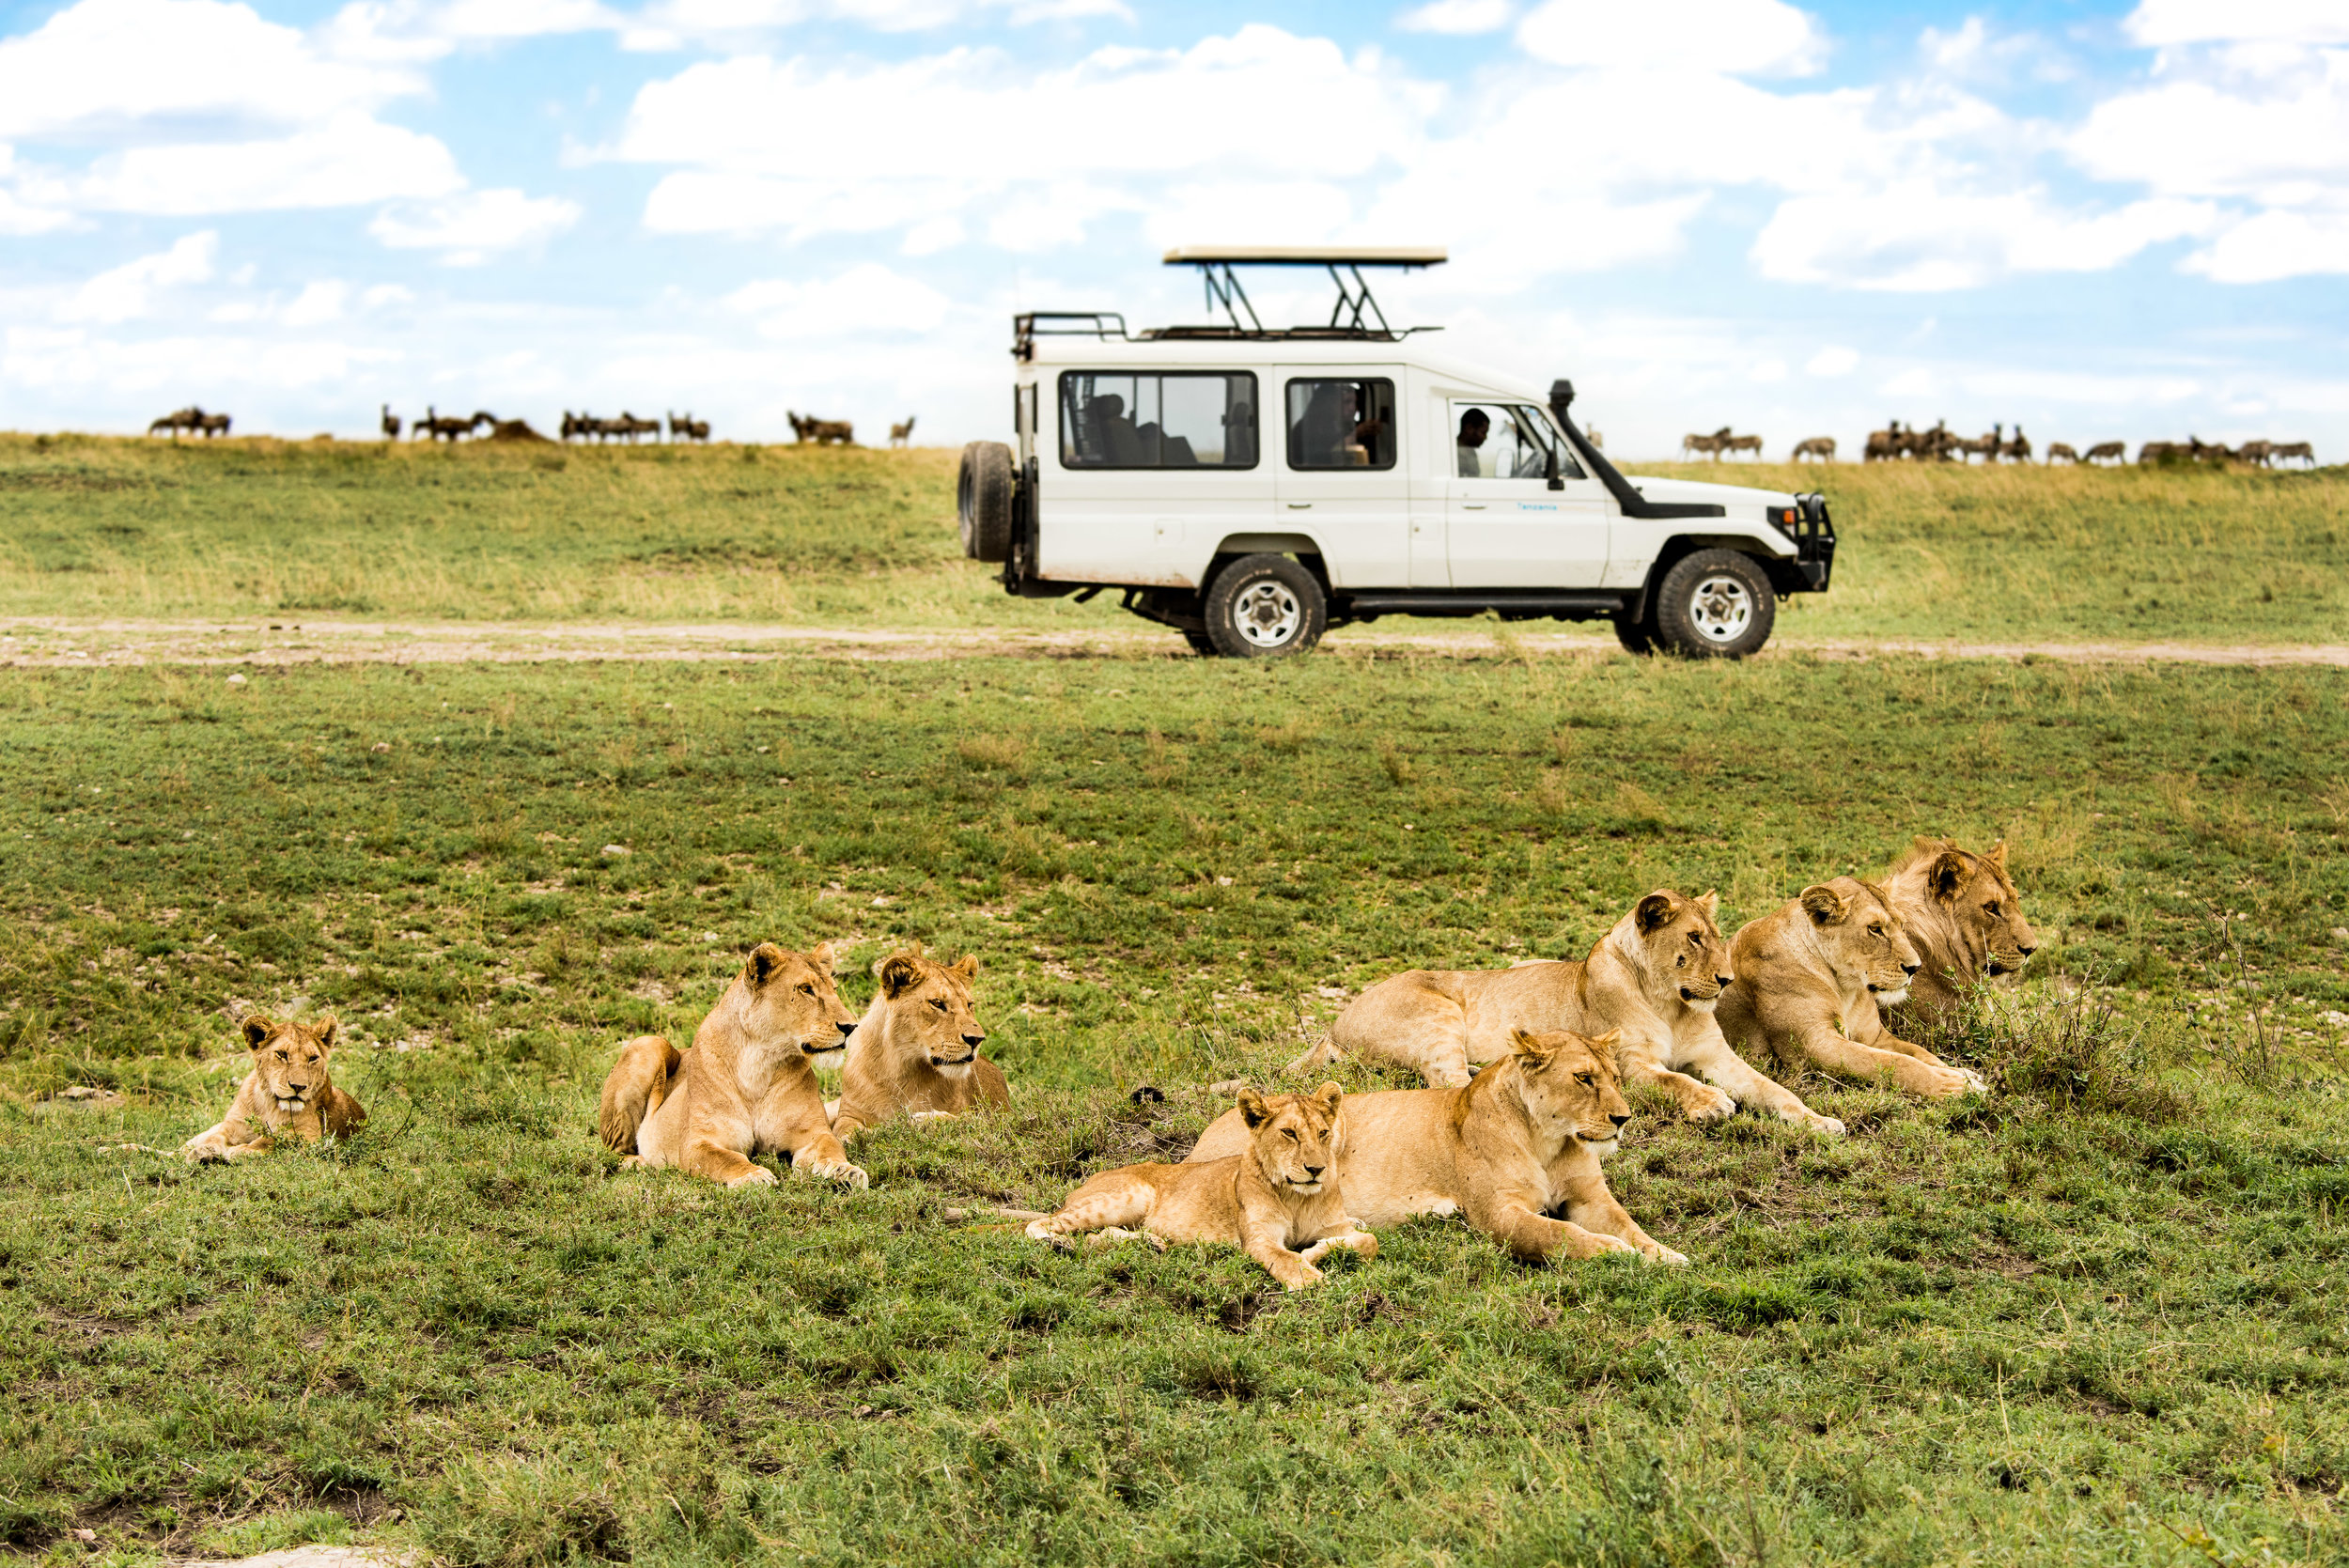 Tanzania-Earth-Photo-By-Tricia-Suriani-Ramsay-11.jpg